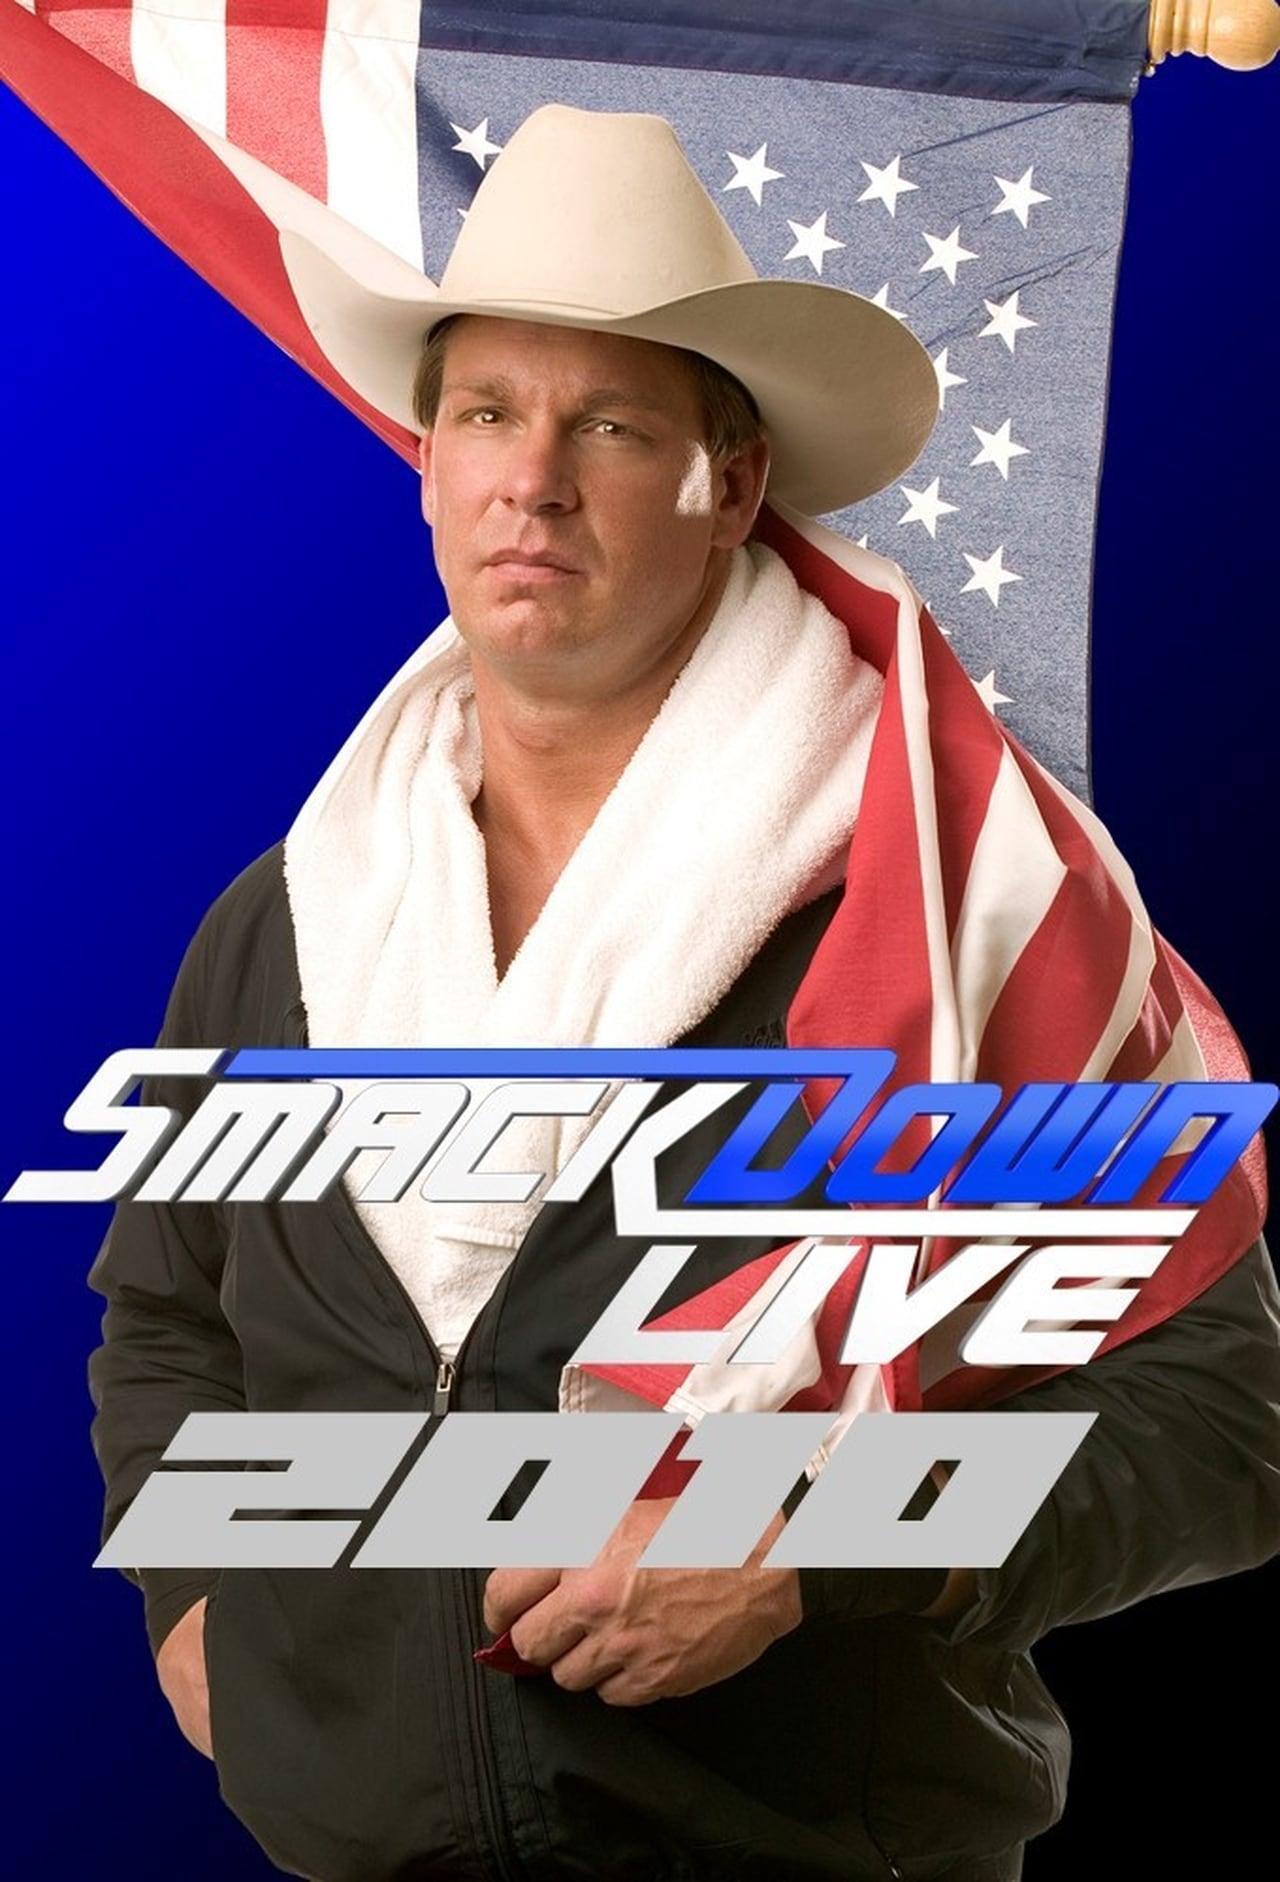 Putlocker Wwe Smackdown Live Season 12 (2010)